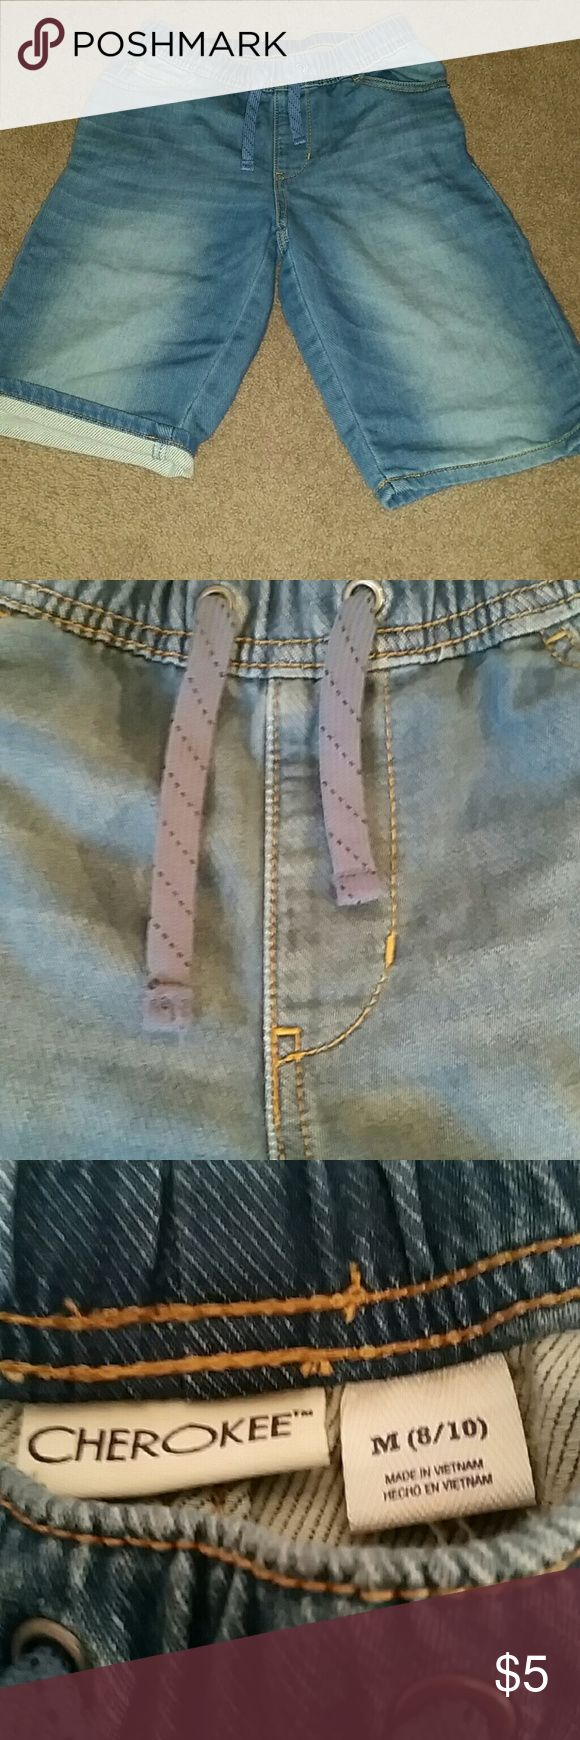 Selling this Cherokee brand jean drawstring shorts. on Poshmark! My username is: pp12345. #shopmycloset #poshmark #fashion #shopping #style #forsale #Cherokee #Other